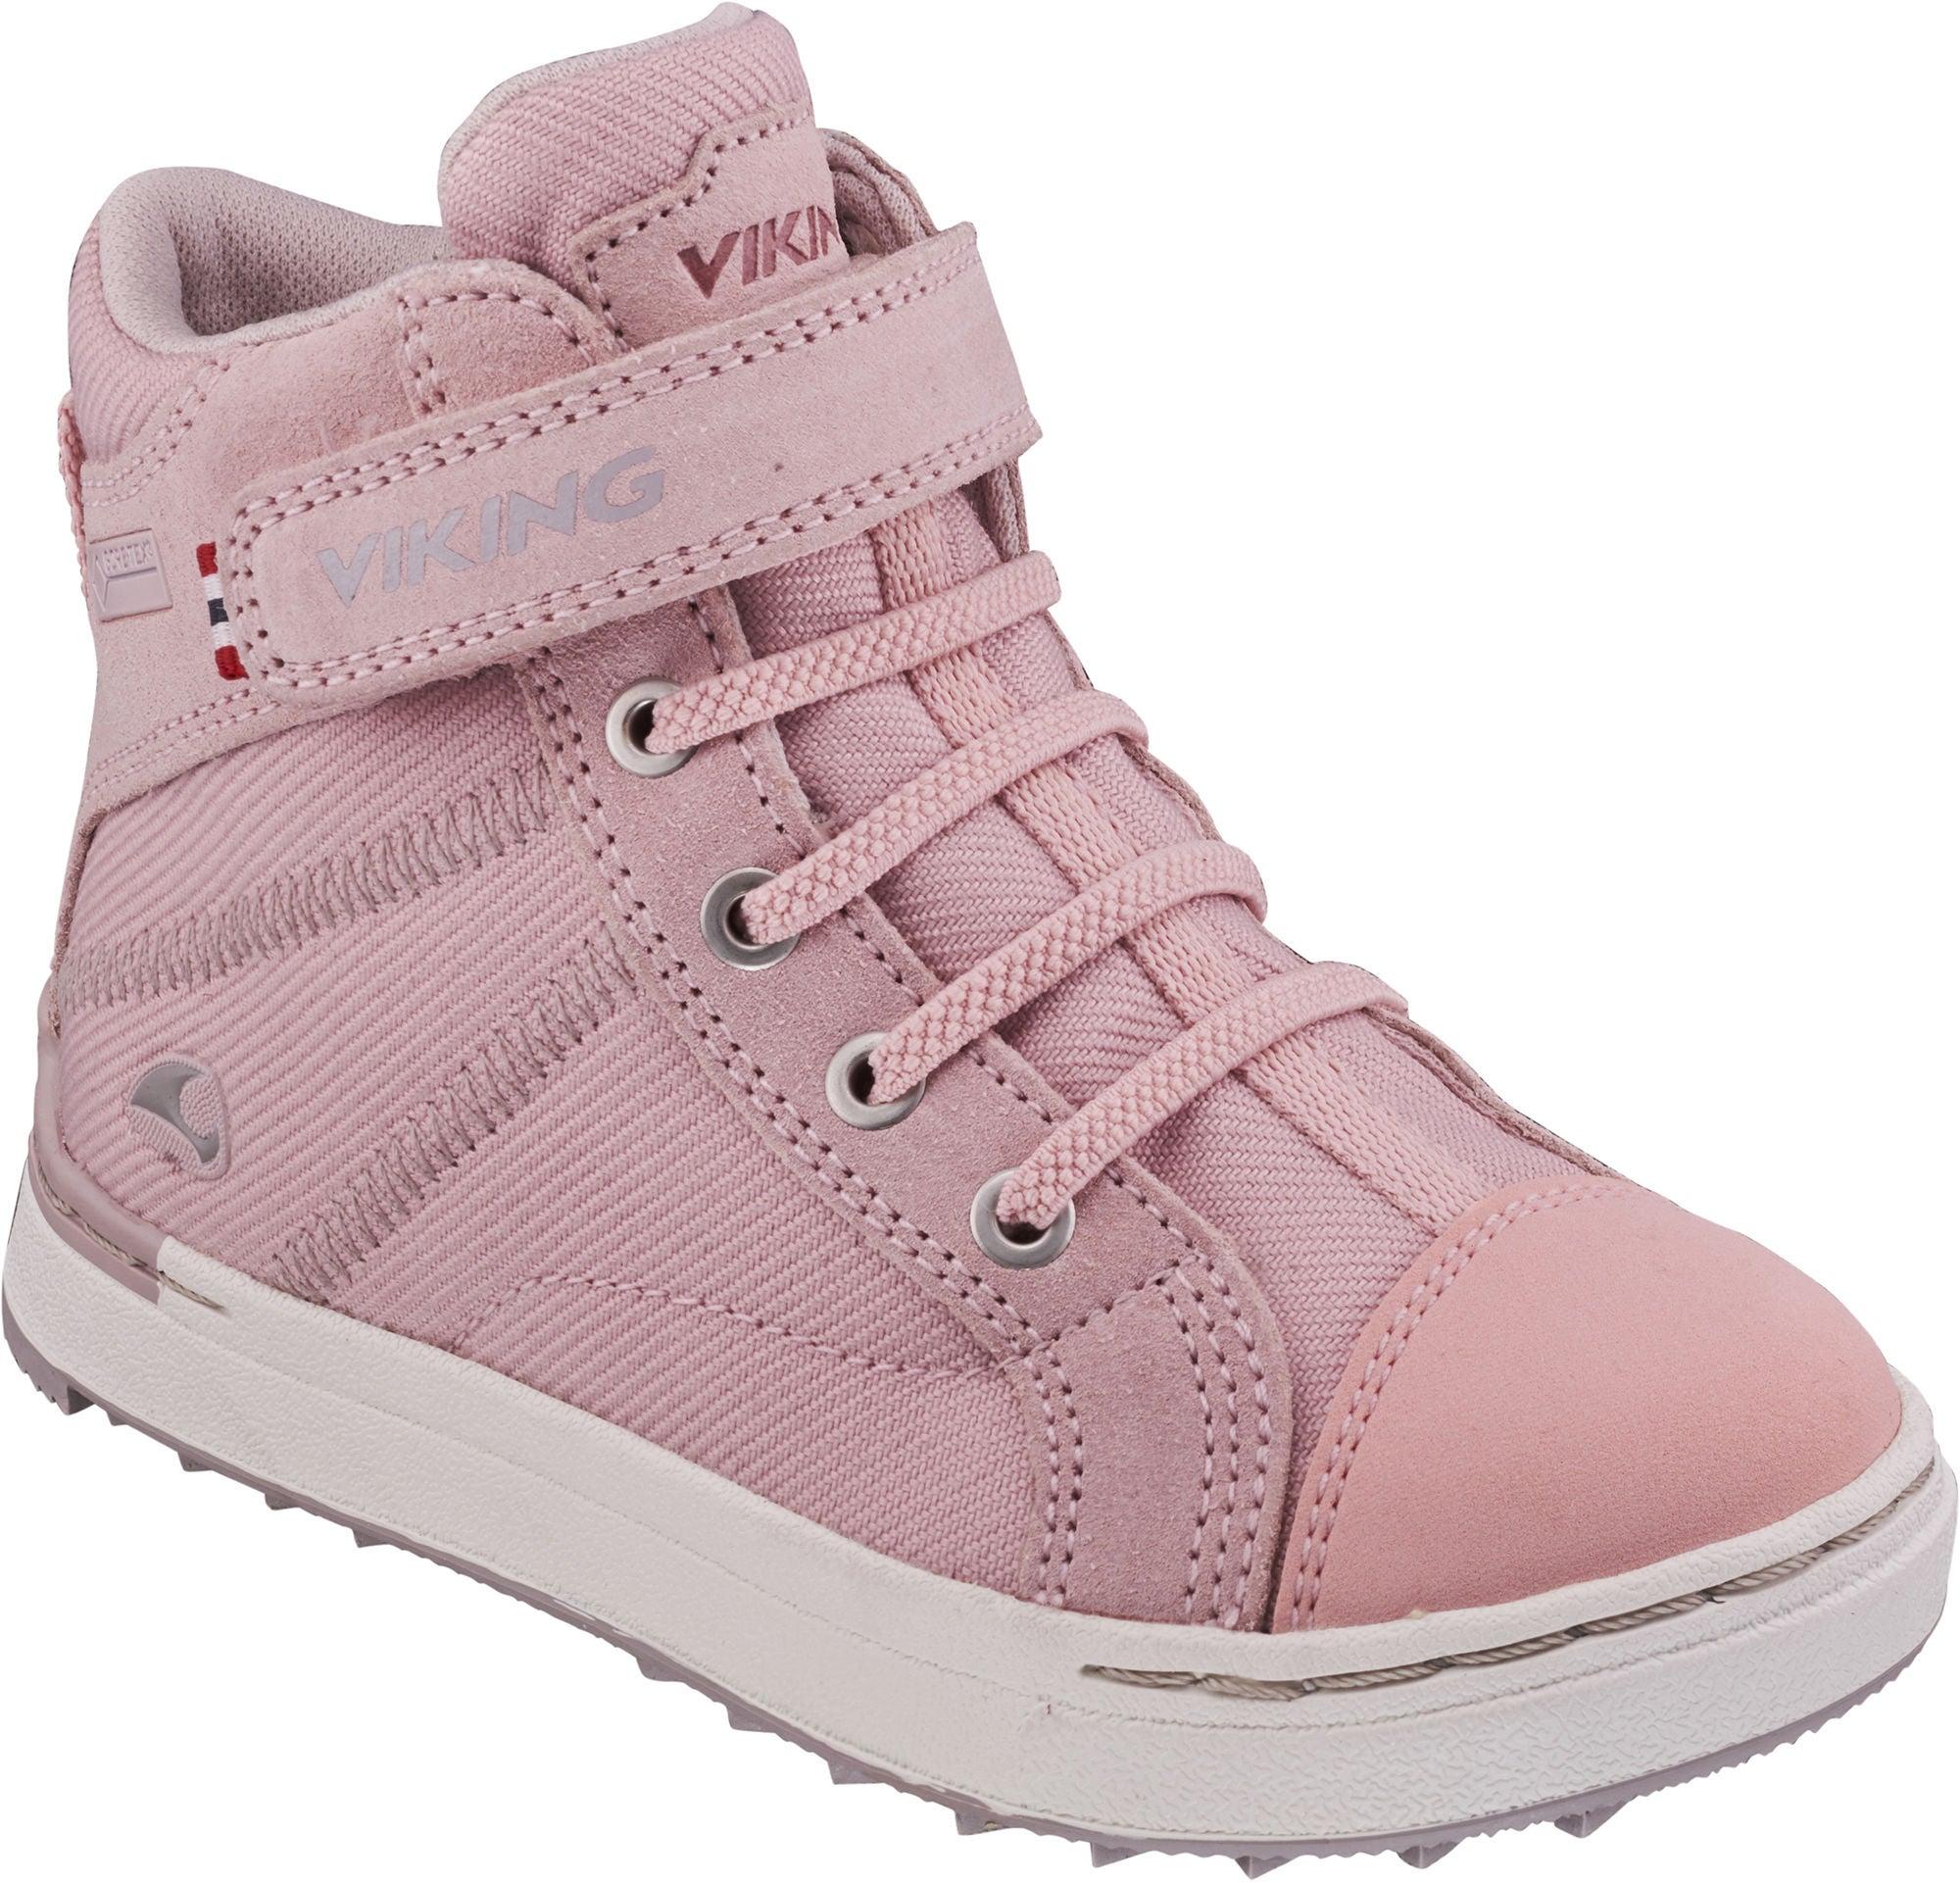 Viking Sagene Mid GTX Sneaker, Light PinkViolet 29 Viking